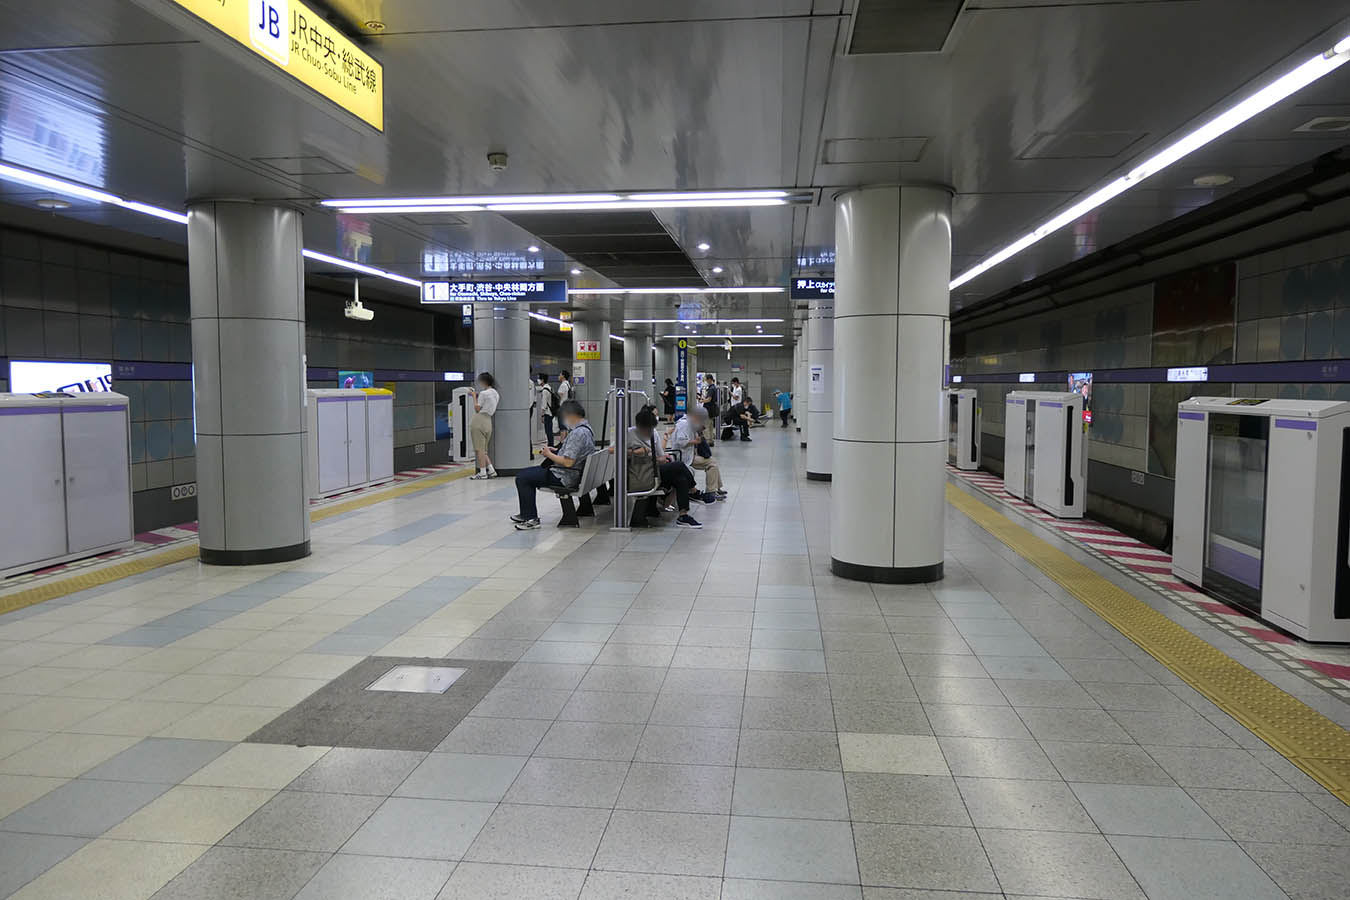 z13_photo02.jpg